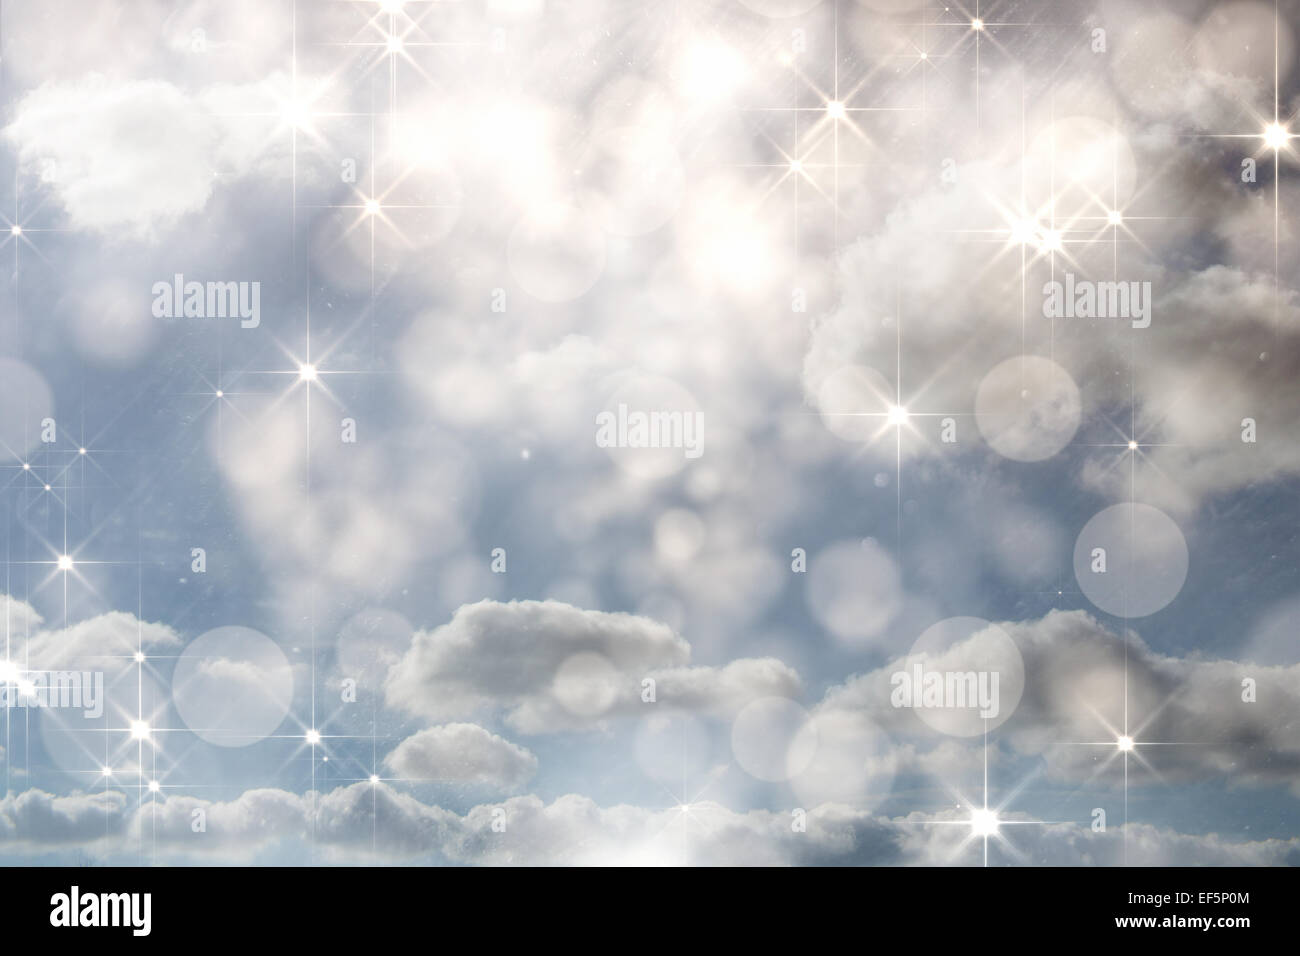 Composite image of shimmering light design on grey - Stock Image